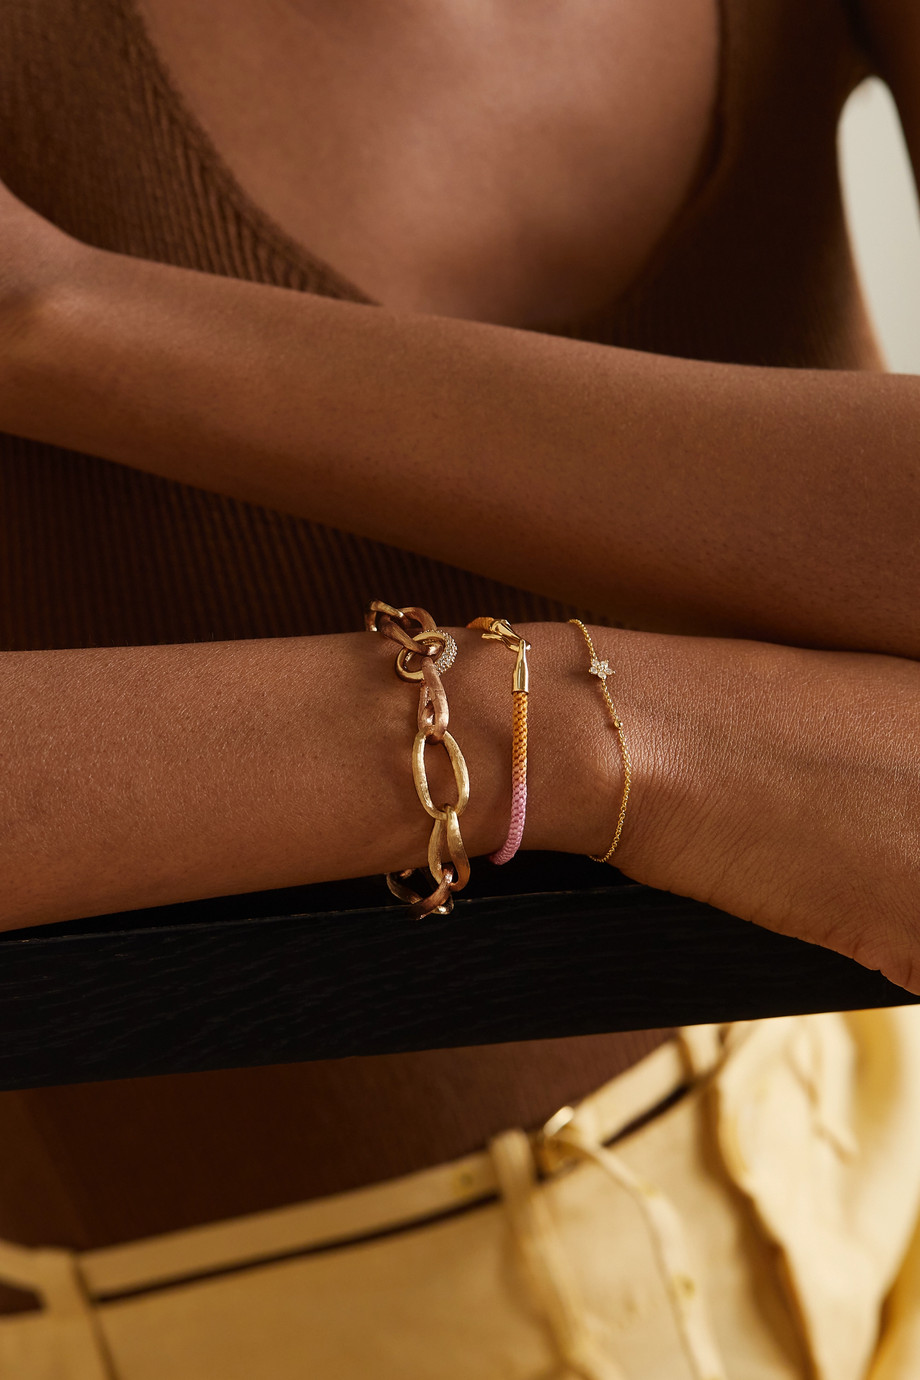 OLE LYNGGAARD COPENHAGEN Bracelet en or jaune et rose 18 carats (750/1000) et diamants Love Medium